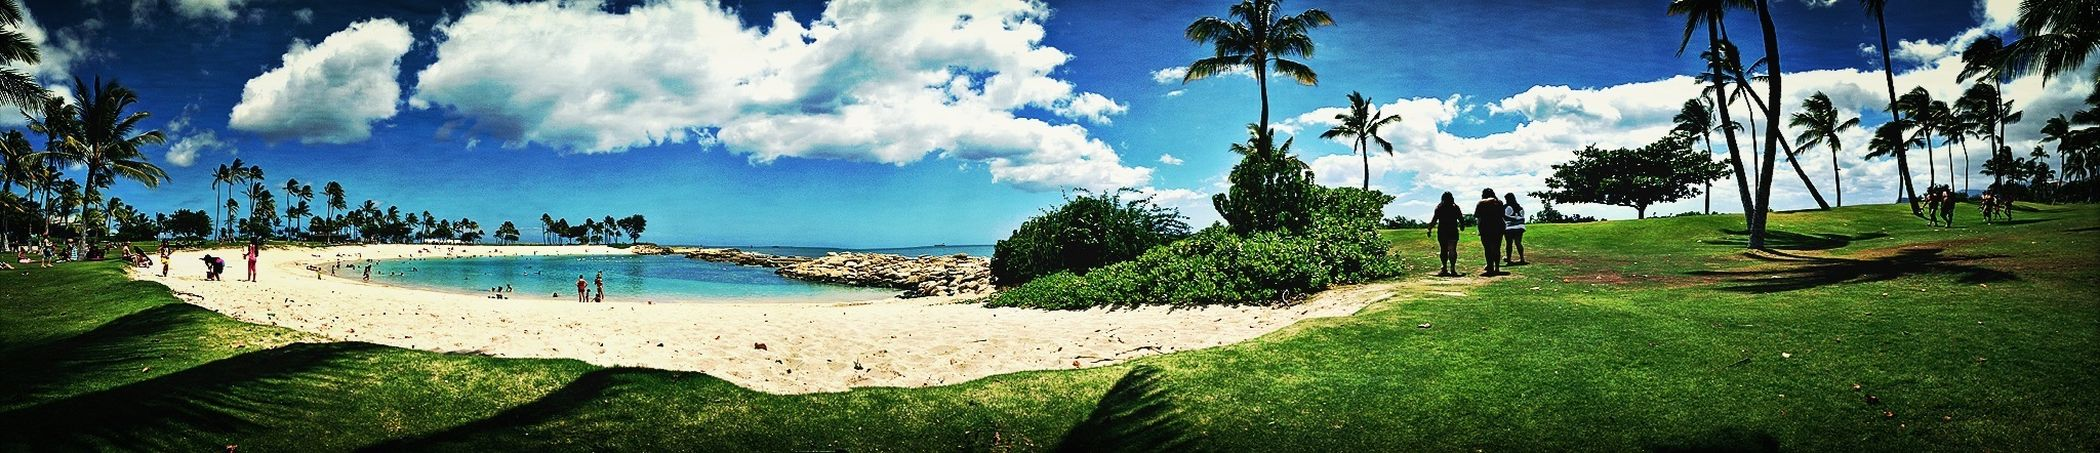 beeeeeach with my main beachs